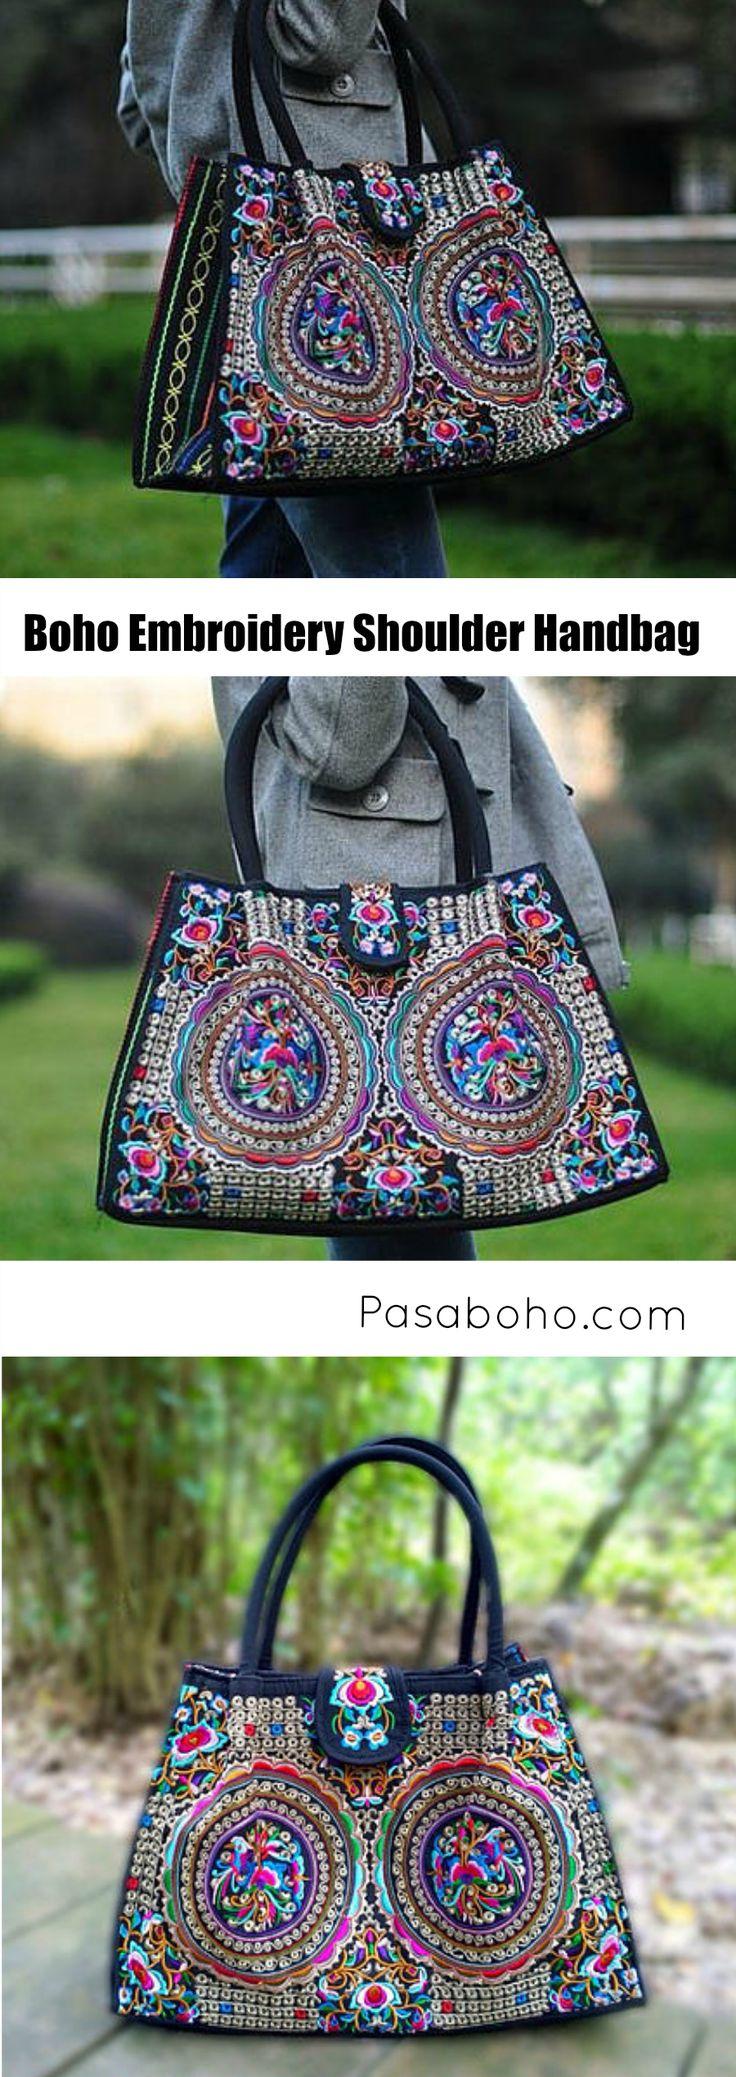 A Boho Shoulder Handbag with Traditional Tribal Embroidery from PASABOHO :: boho hippie gypsy style :: free spirit :: floral :: summer :: love :: street style :: modern vintage :: ethnic tribal :: boho bag